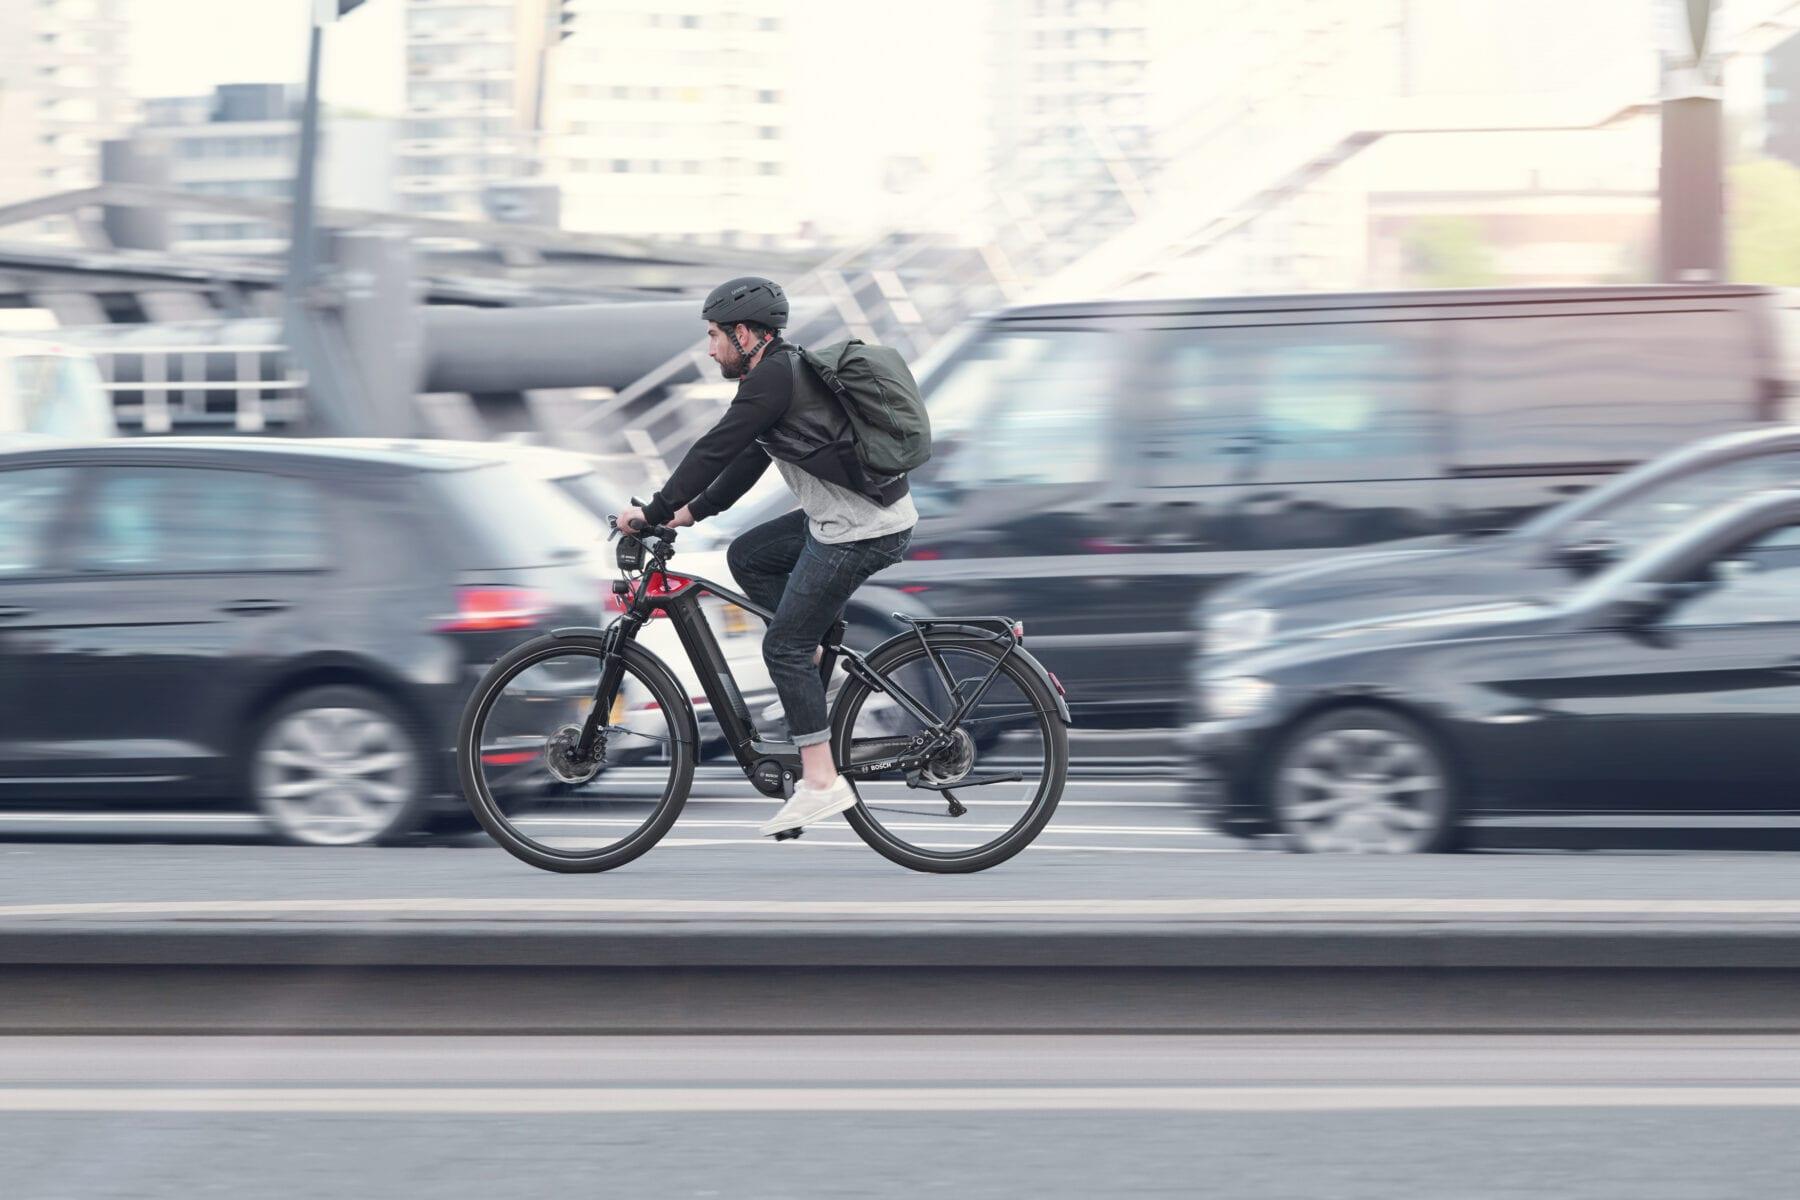 elektrische fiets onderhouden rotterdam